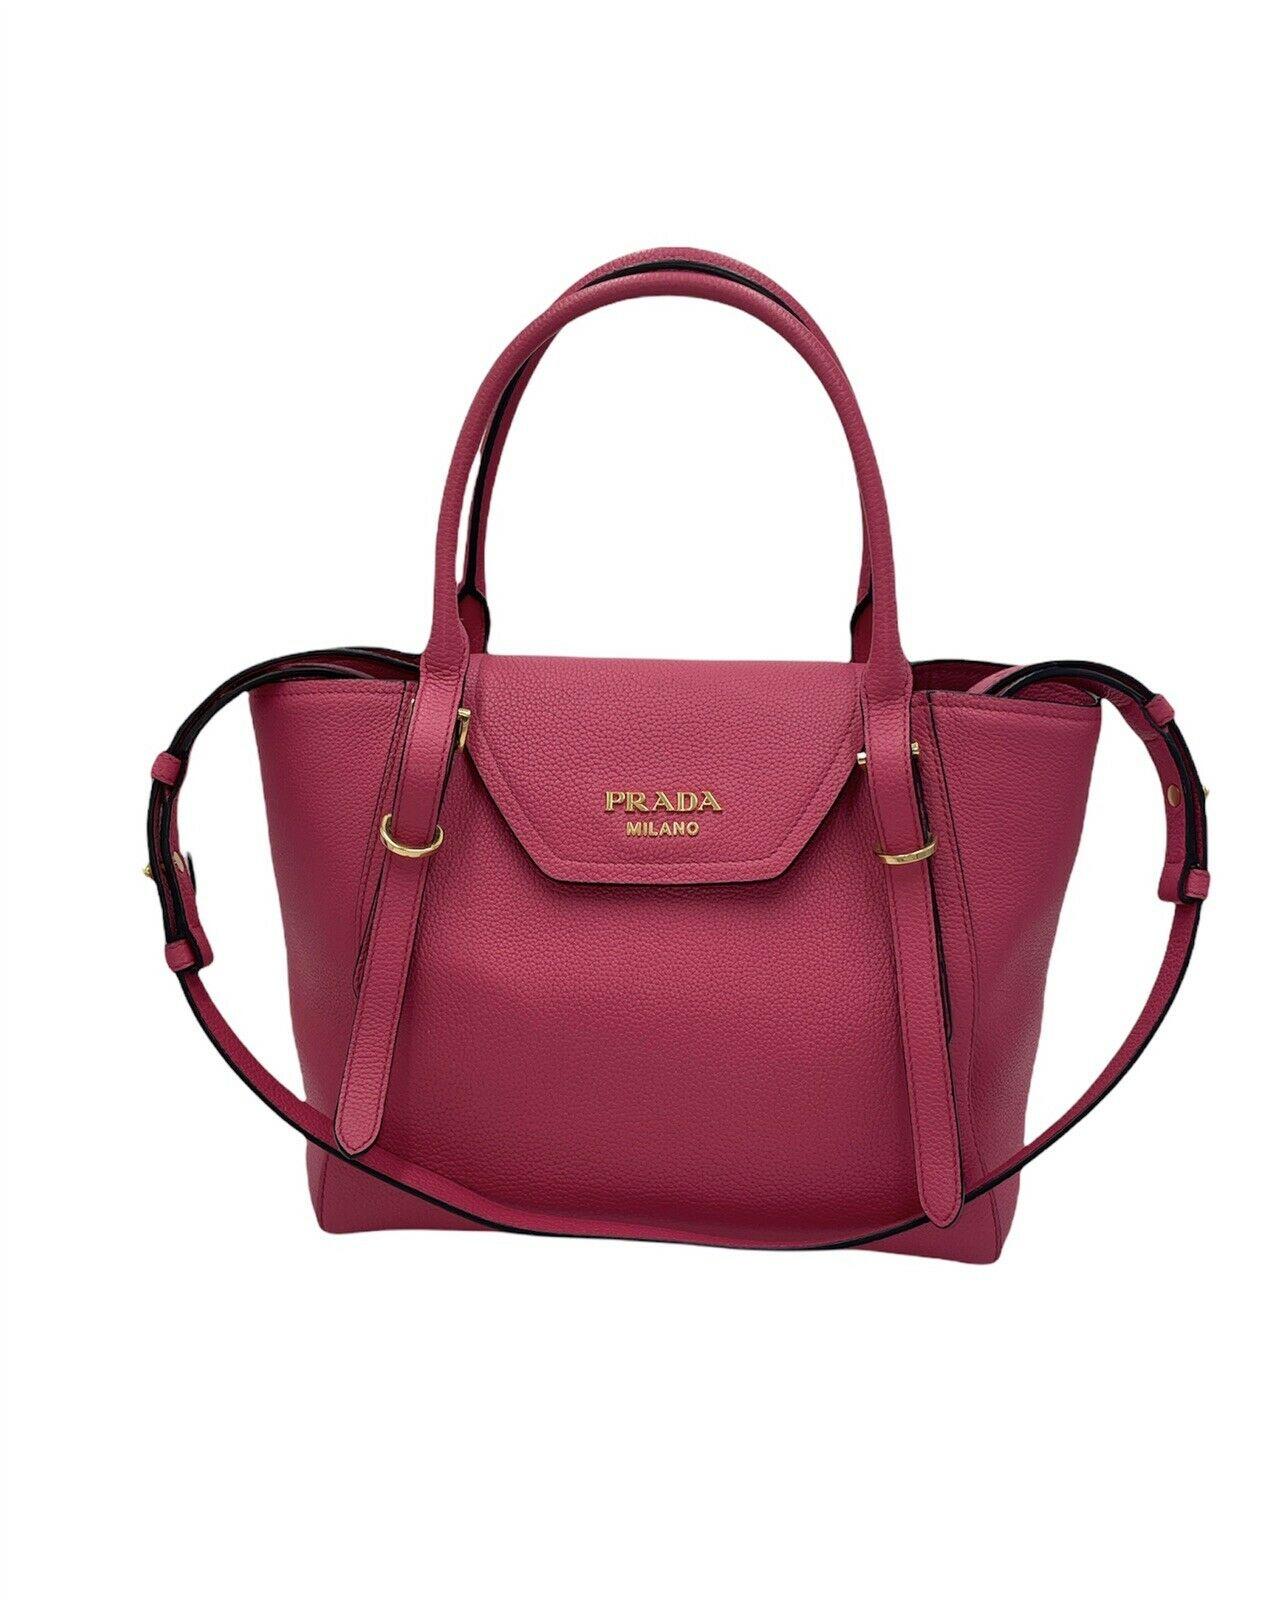 PRADA Vitello Grain Magenta Pink Top Handle Crossbody Handbag